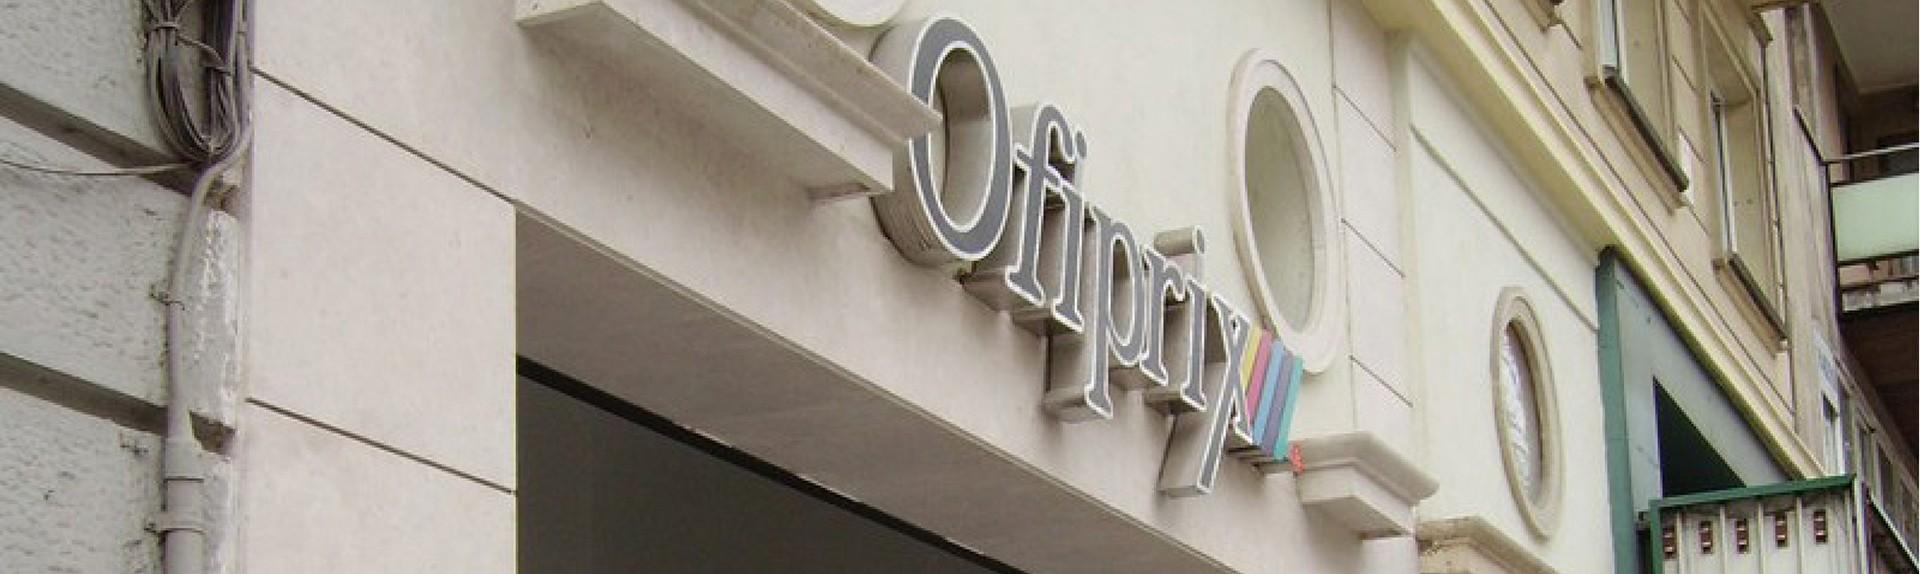 Tienda Ofiprix de Alicante